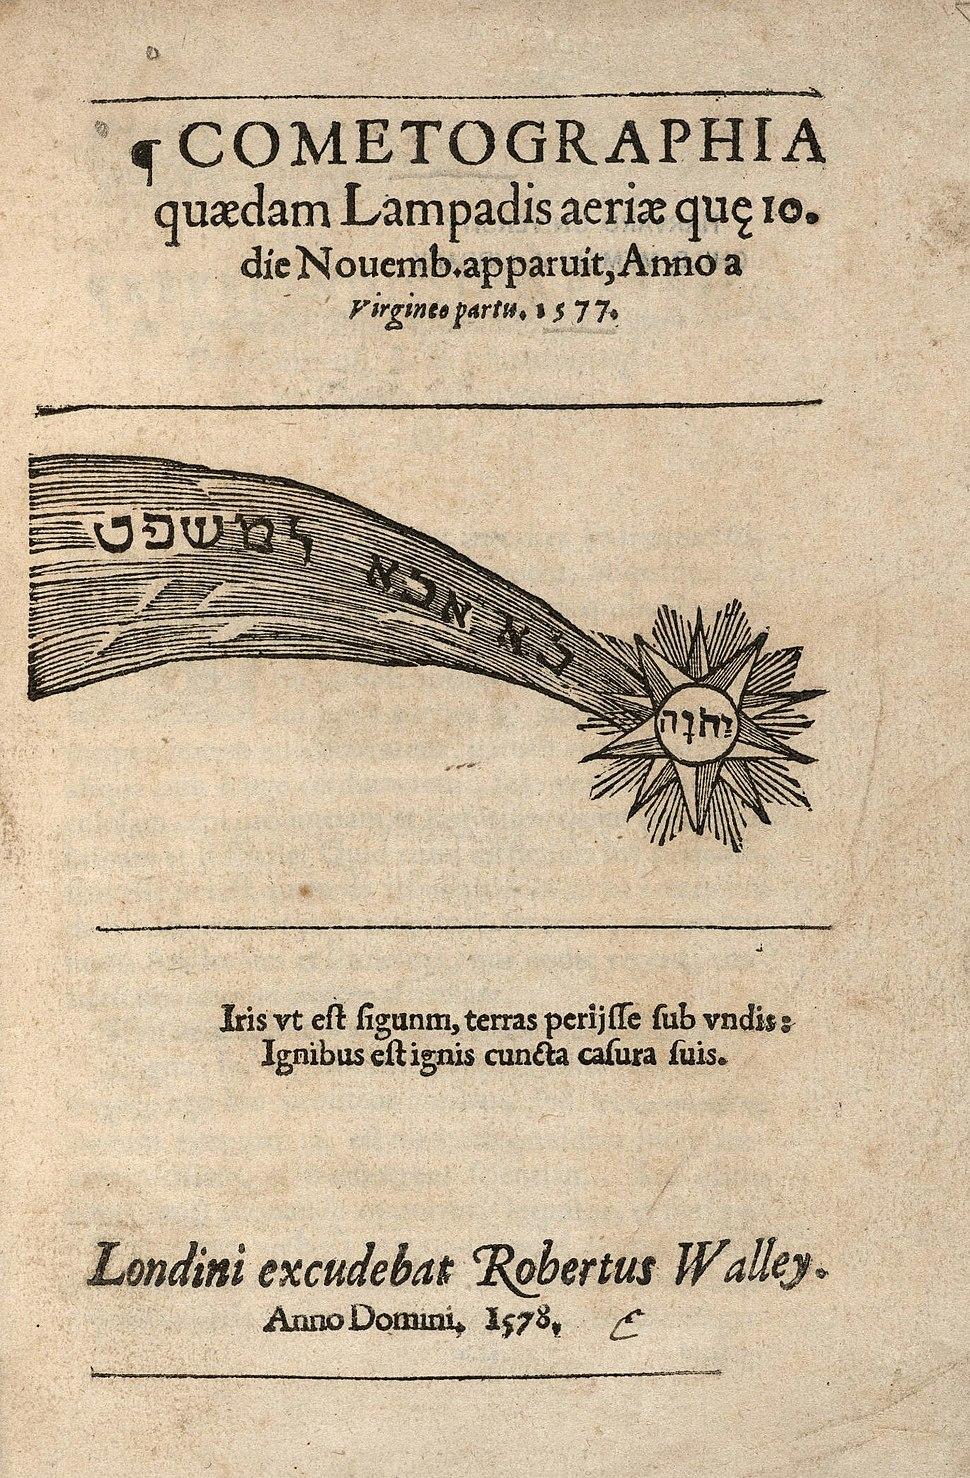 Houghton STC 1416 - Cometographia, 1578